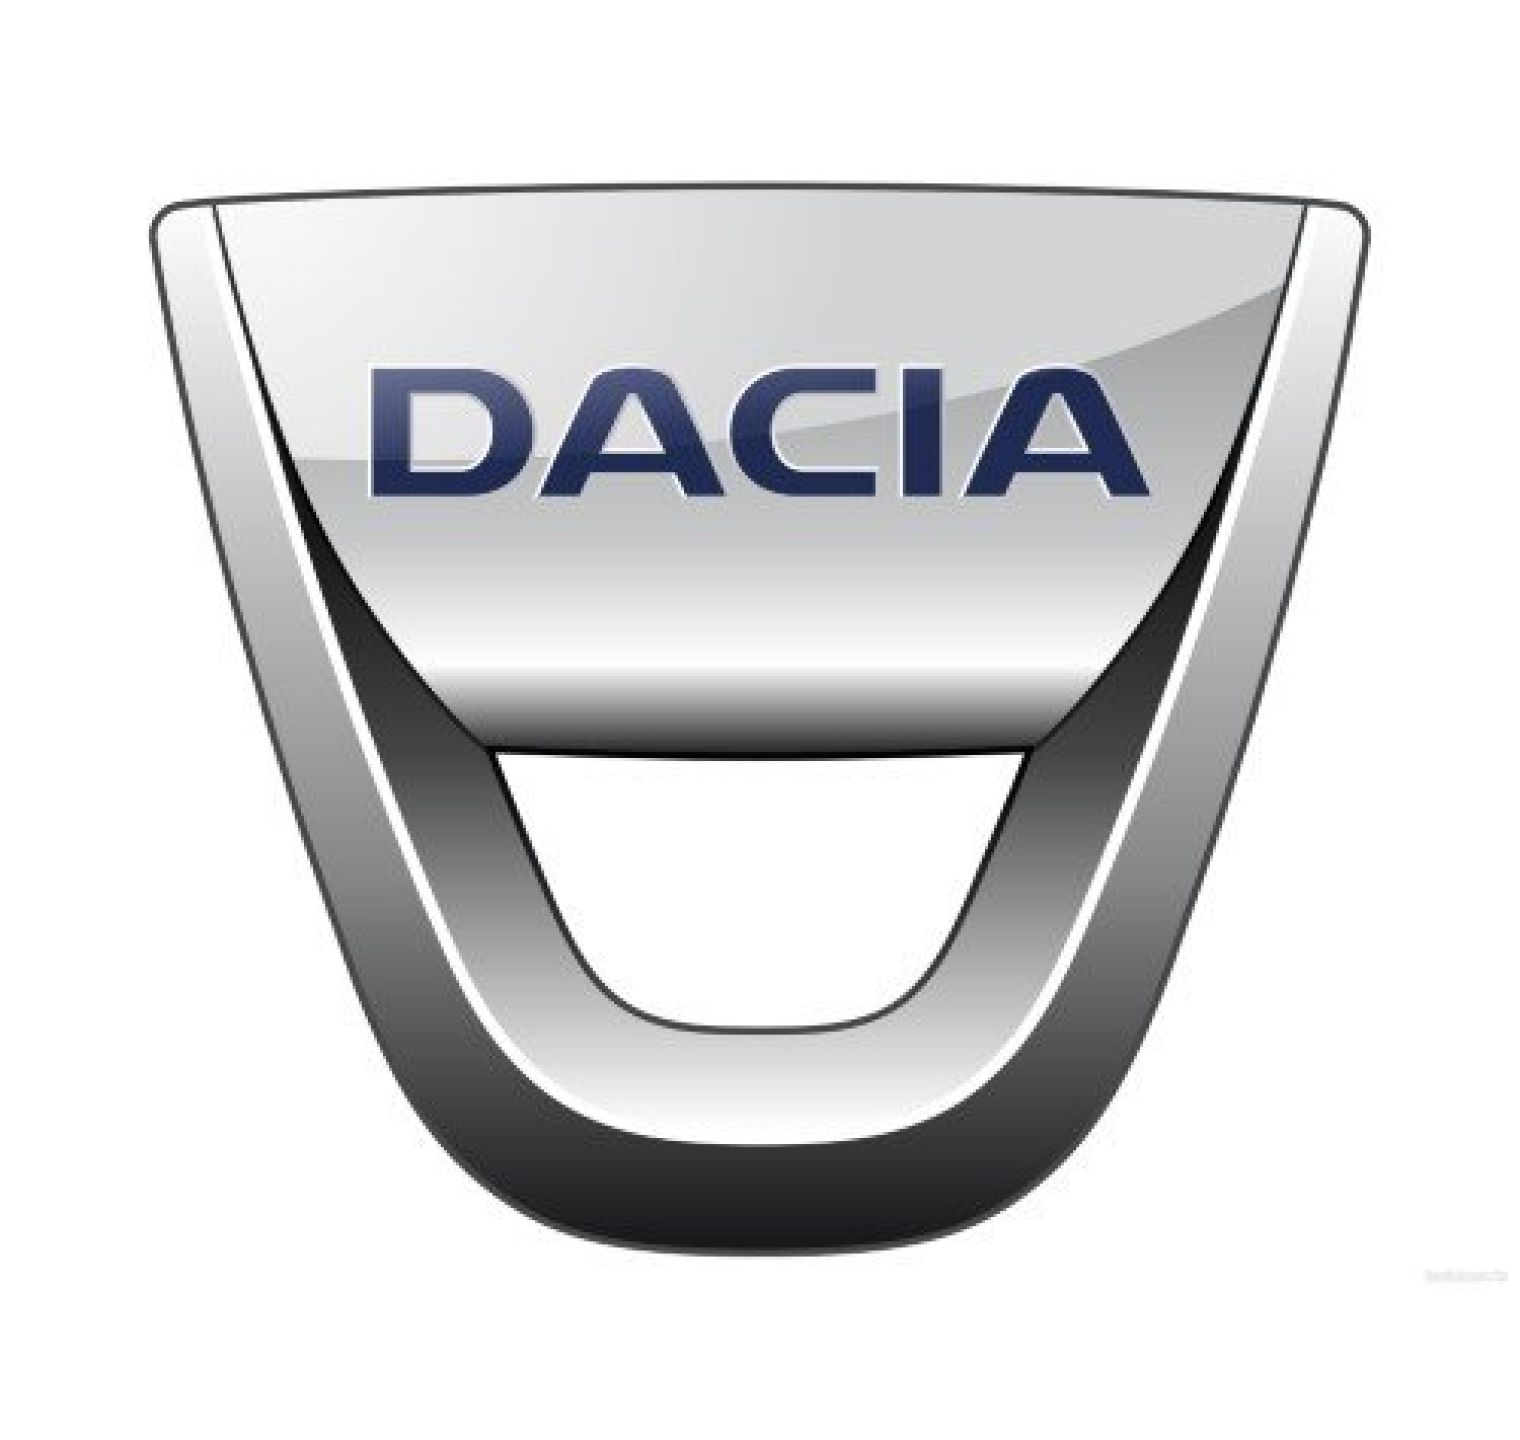 Dacia Lodgy (vanaf 2012) - achterruitenwisser Valeo Silencio flatblade